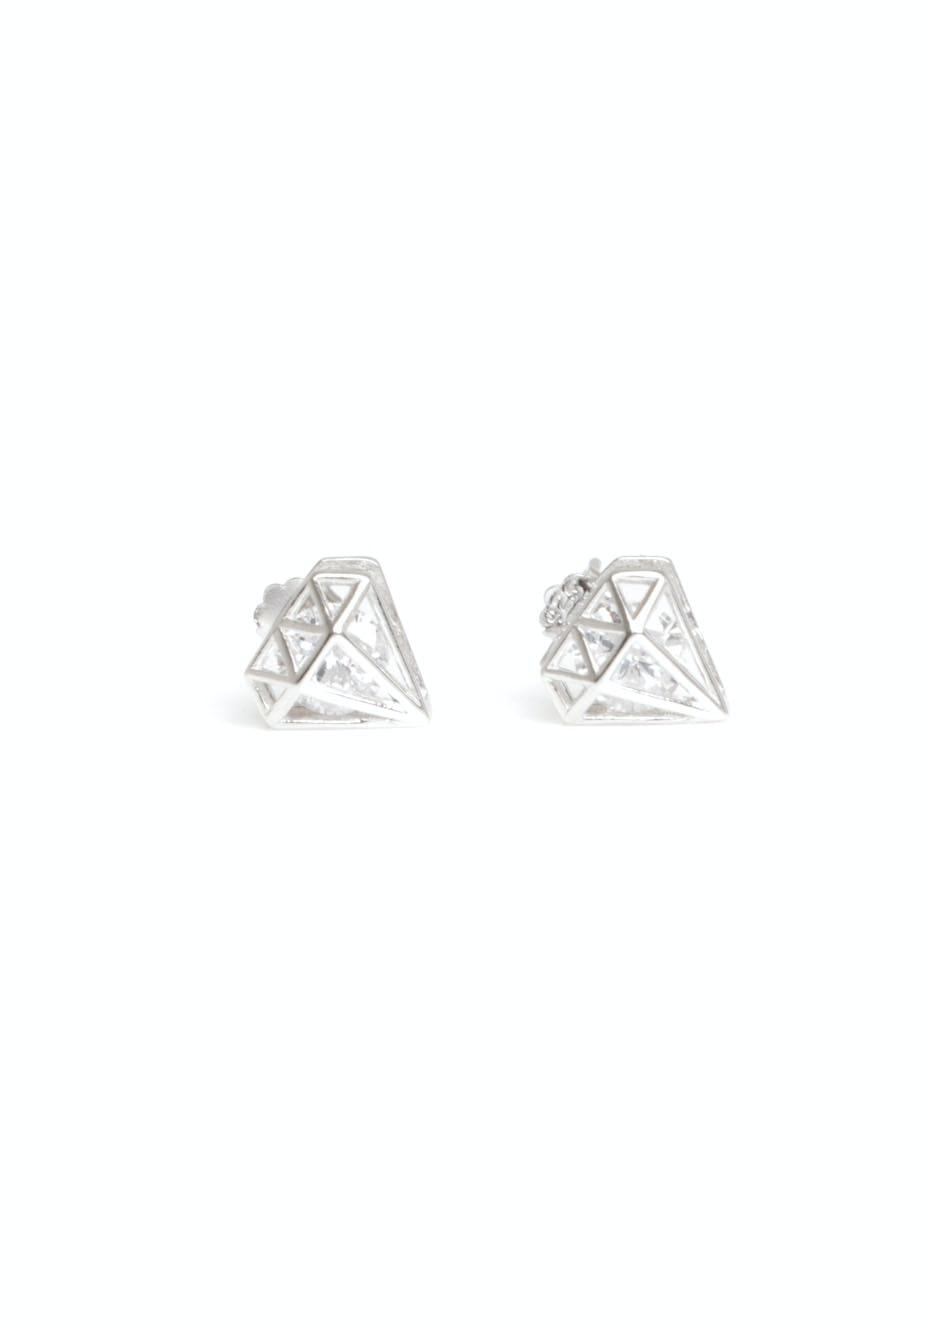 Clear gem diamond stud silver